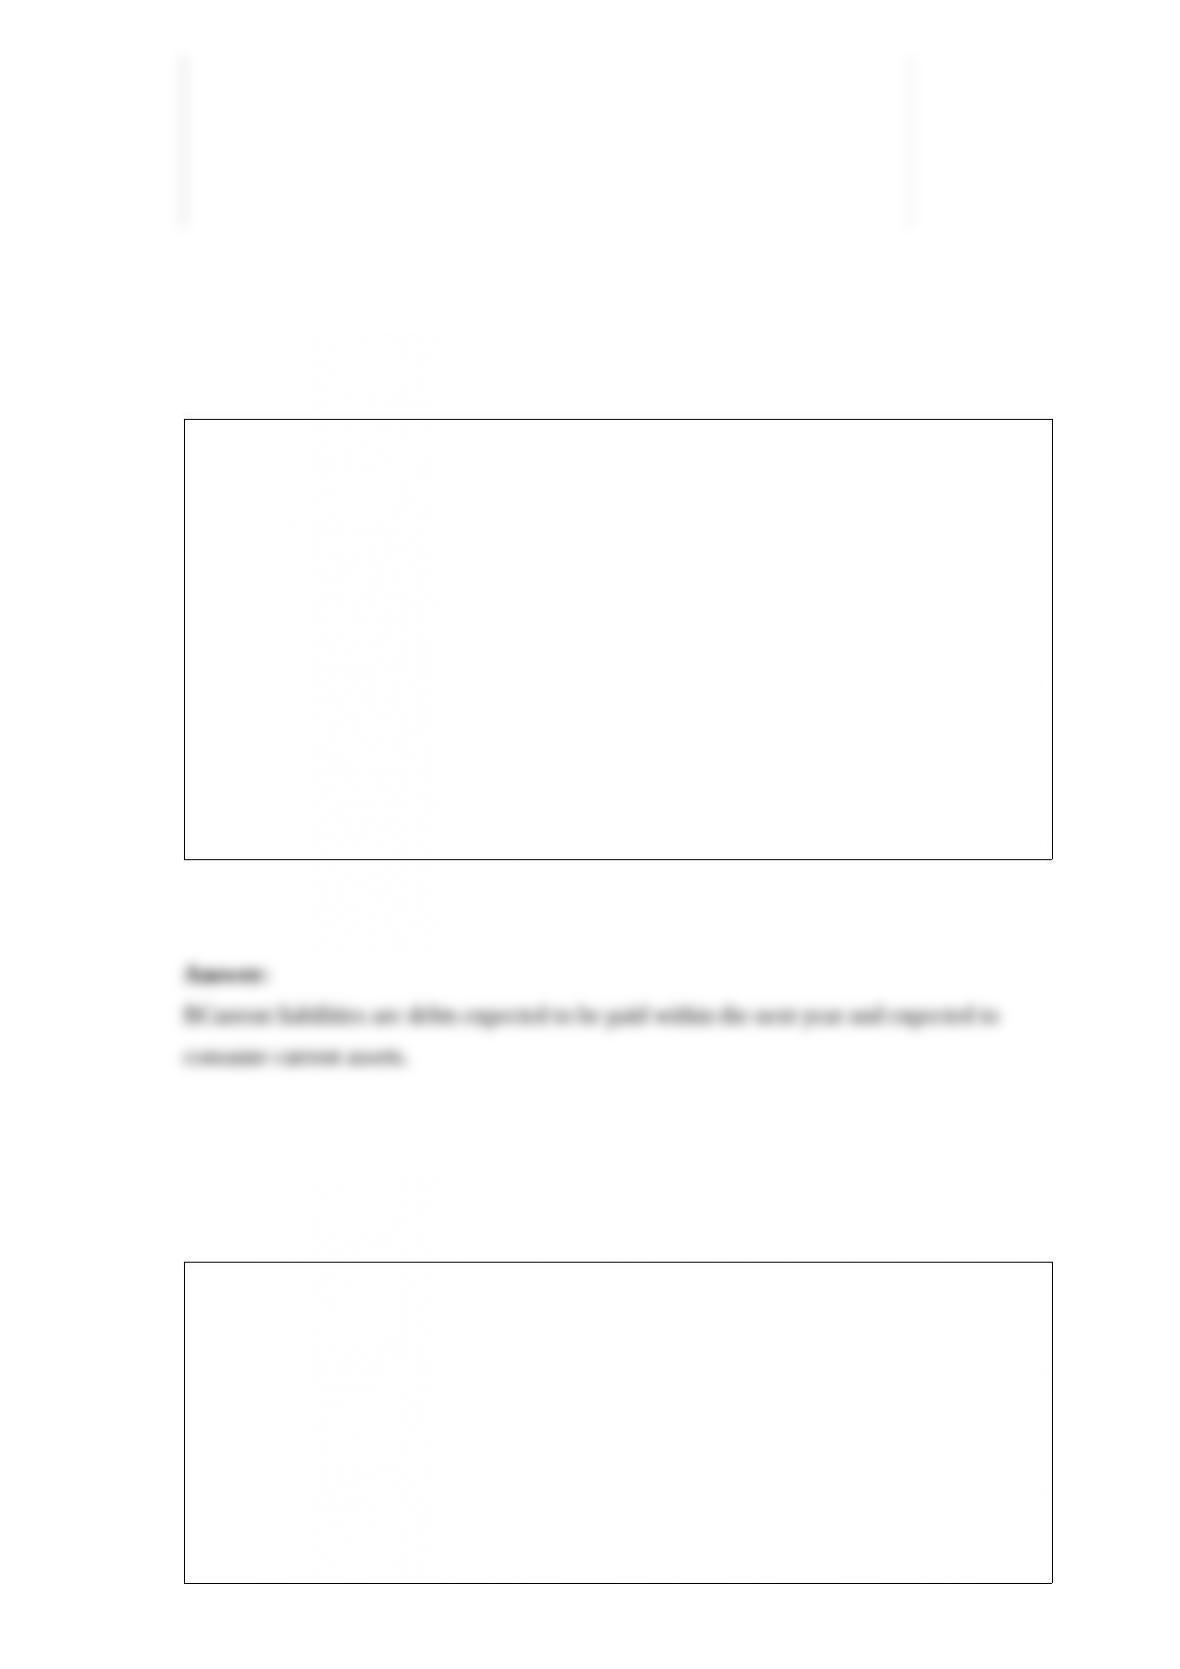 Accounting 419 Midterm 2 | Get 24/7 Homework Help | Online ...